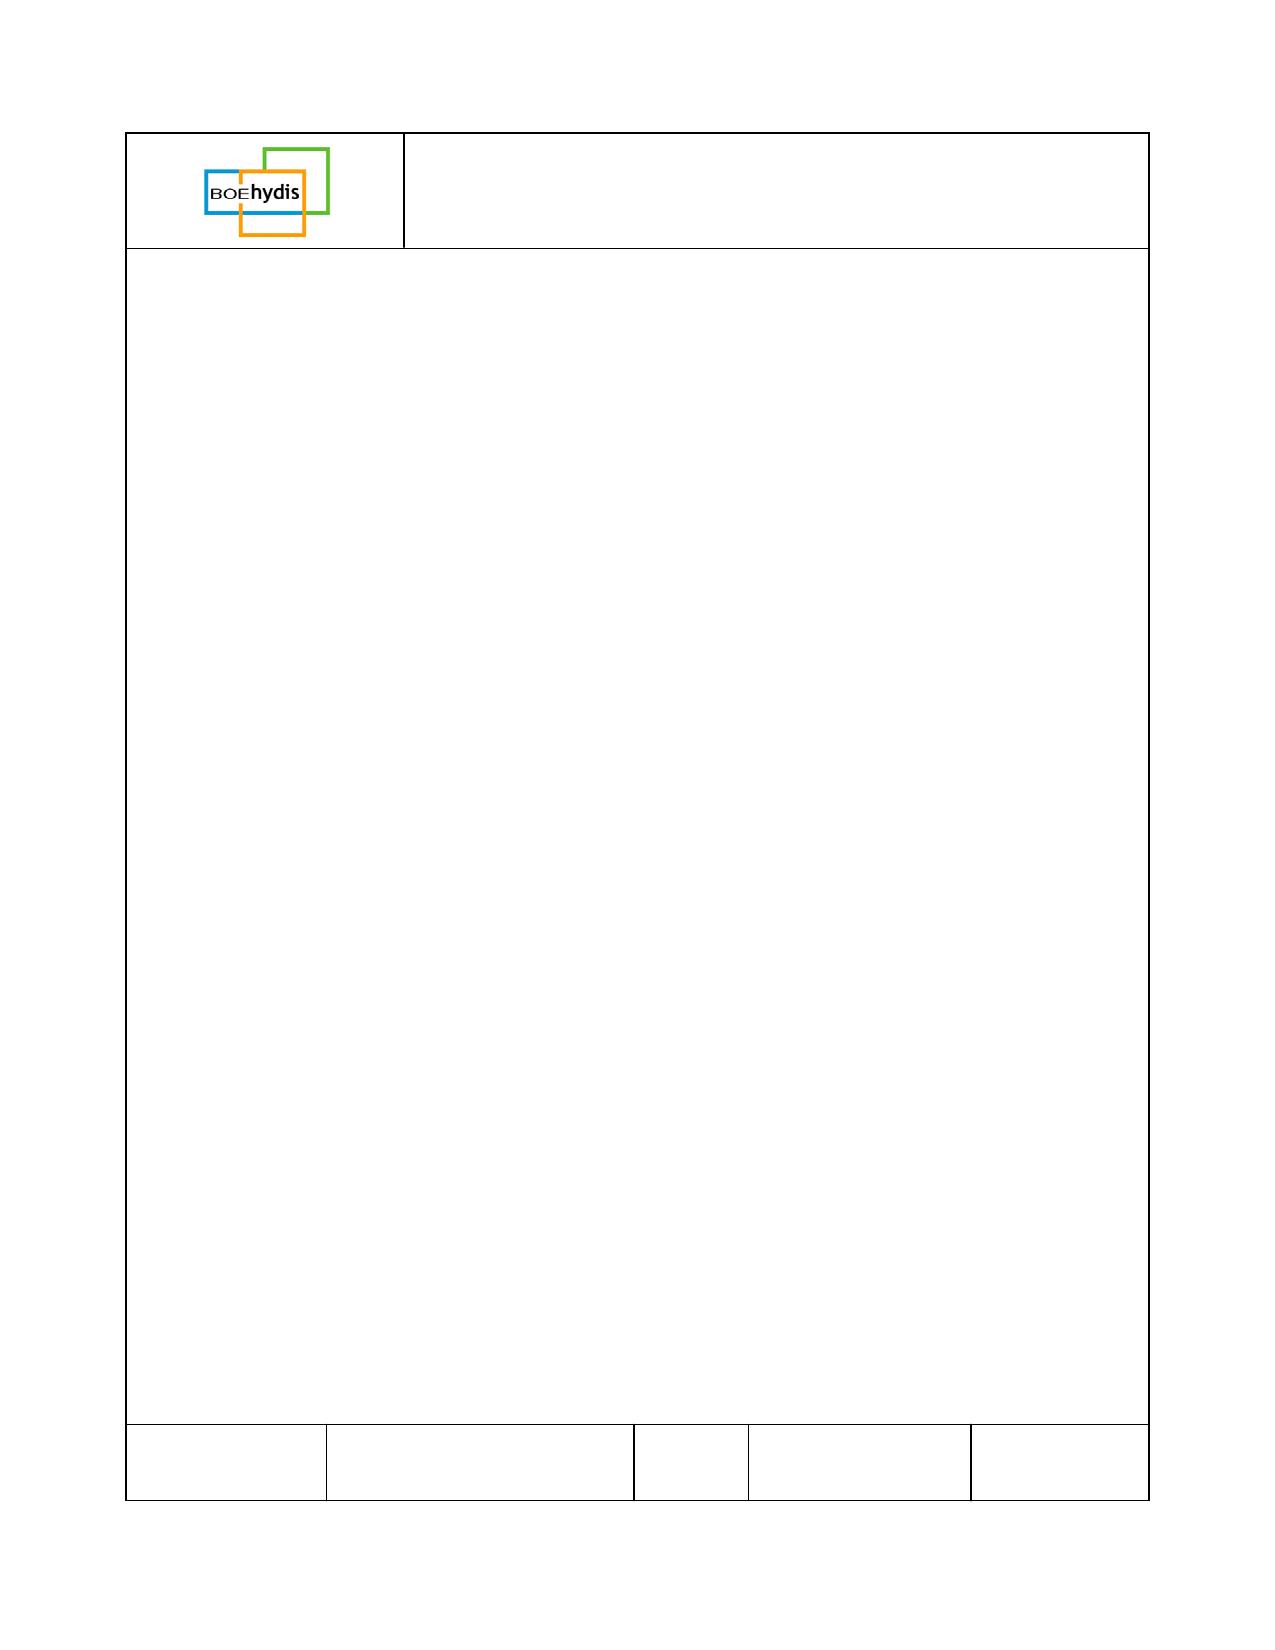 HV133WX1-100 Datasheet, HV133WX1-100 PDF,ピン配置, 機能